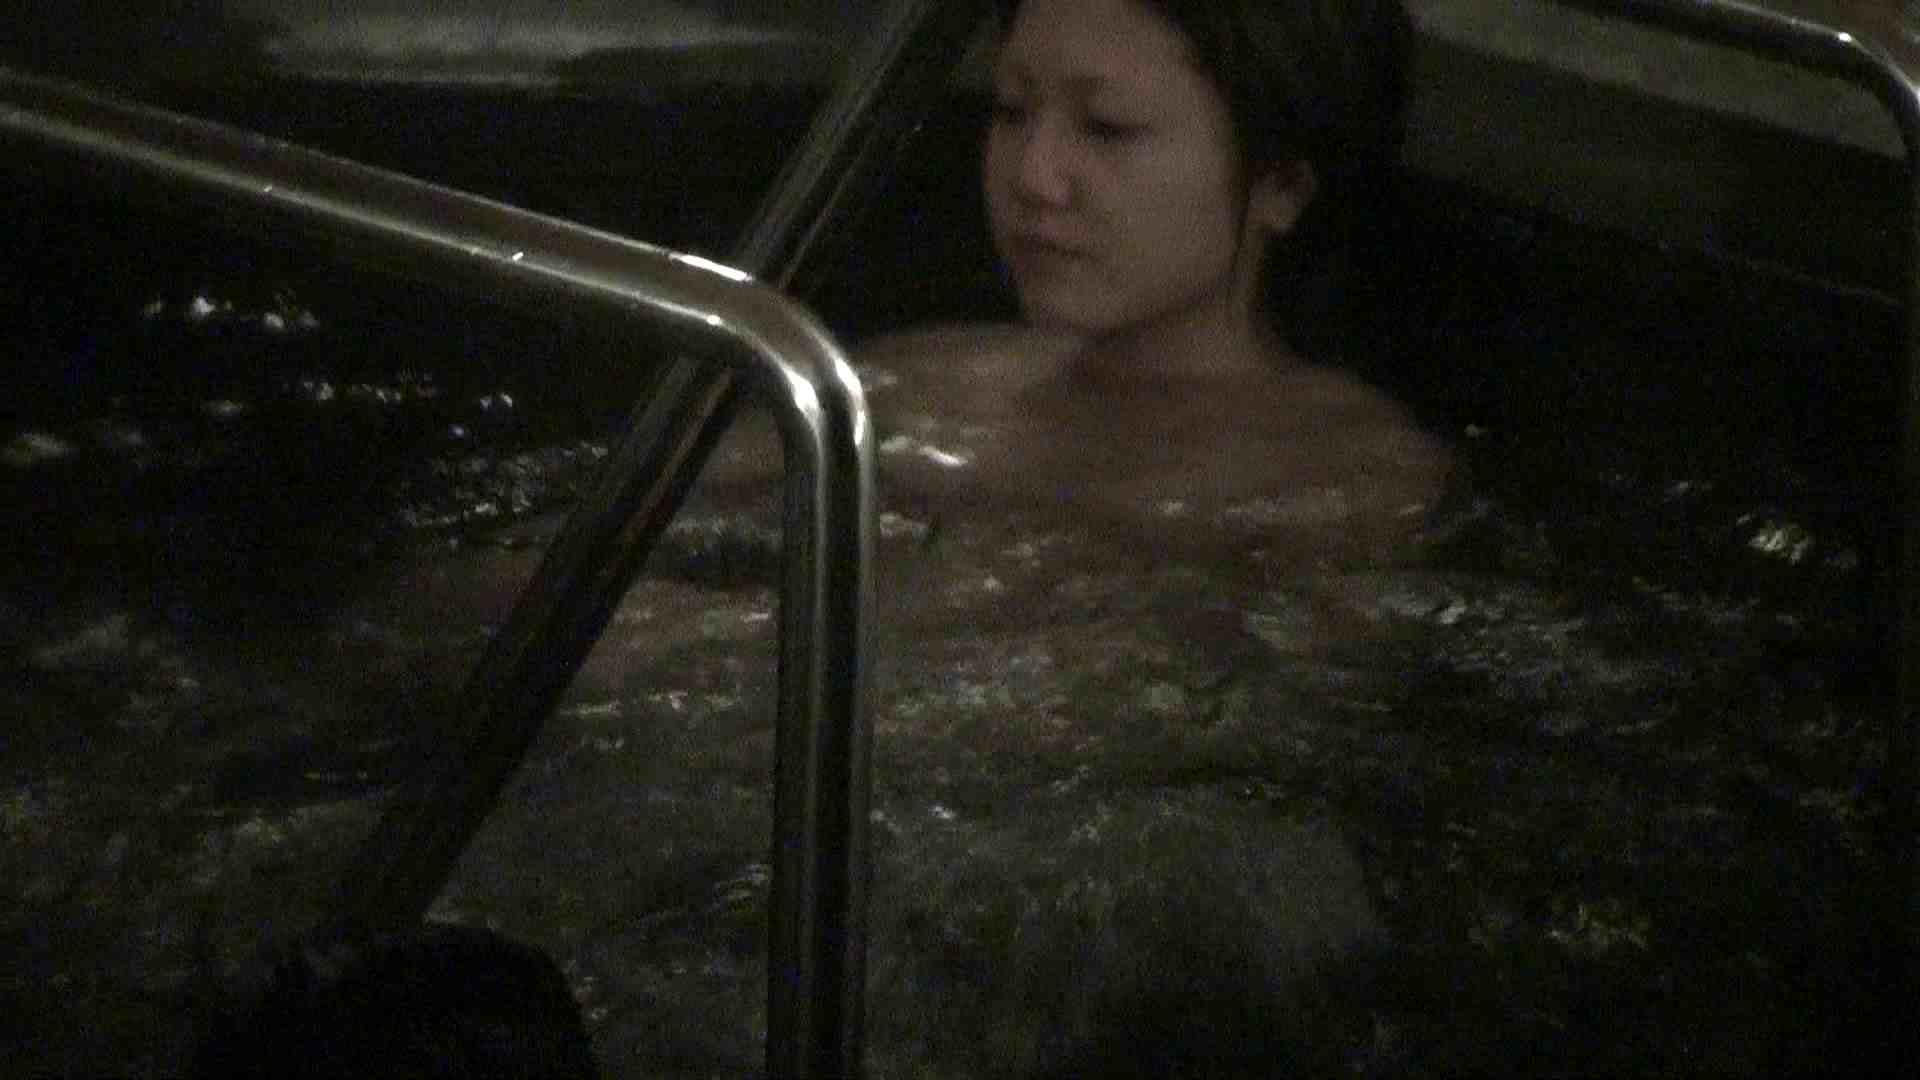 Aquaな露天風呂Vol.411 盗撮シリーズ   露天風呂編  82PIX 69